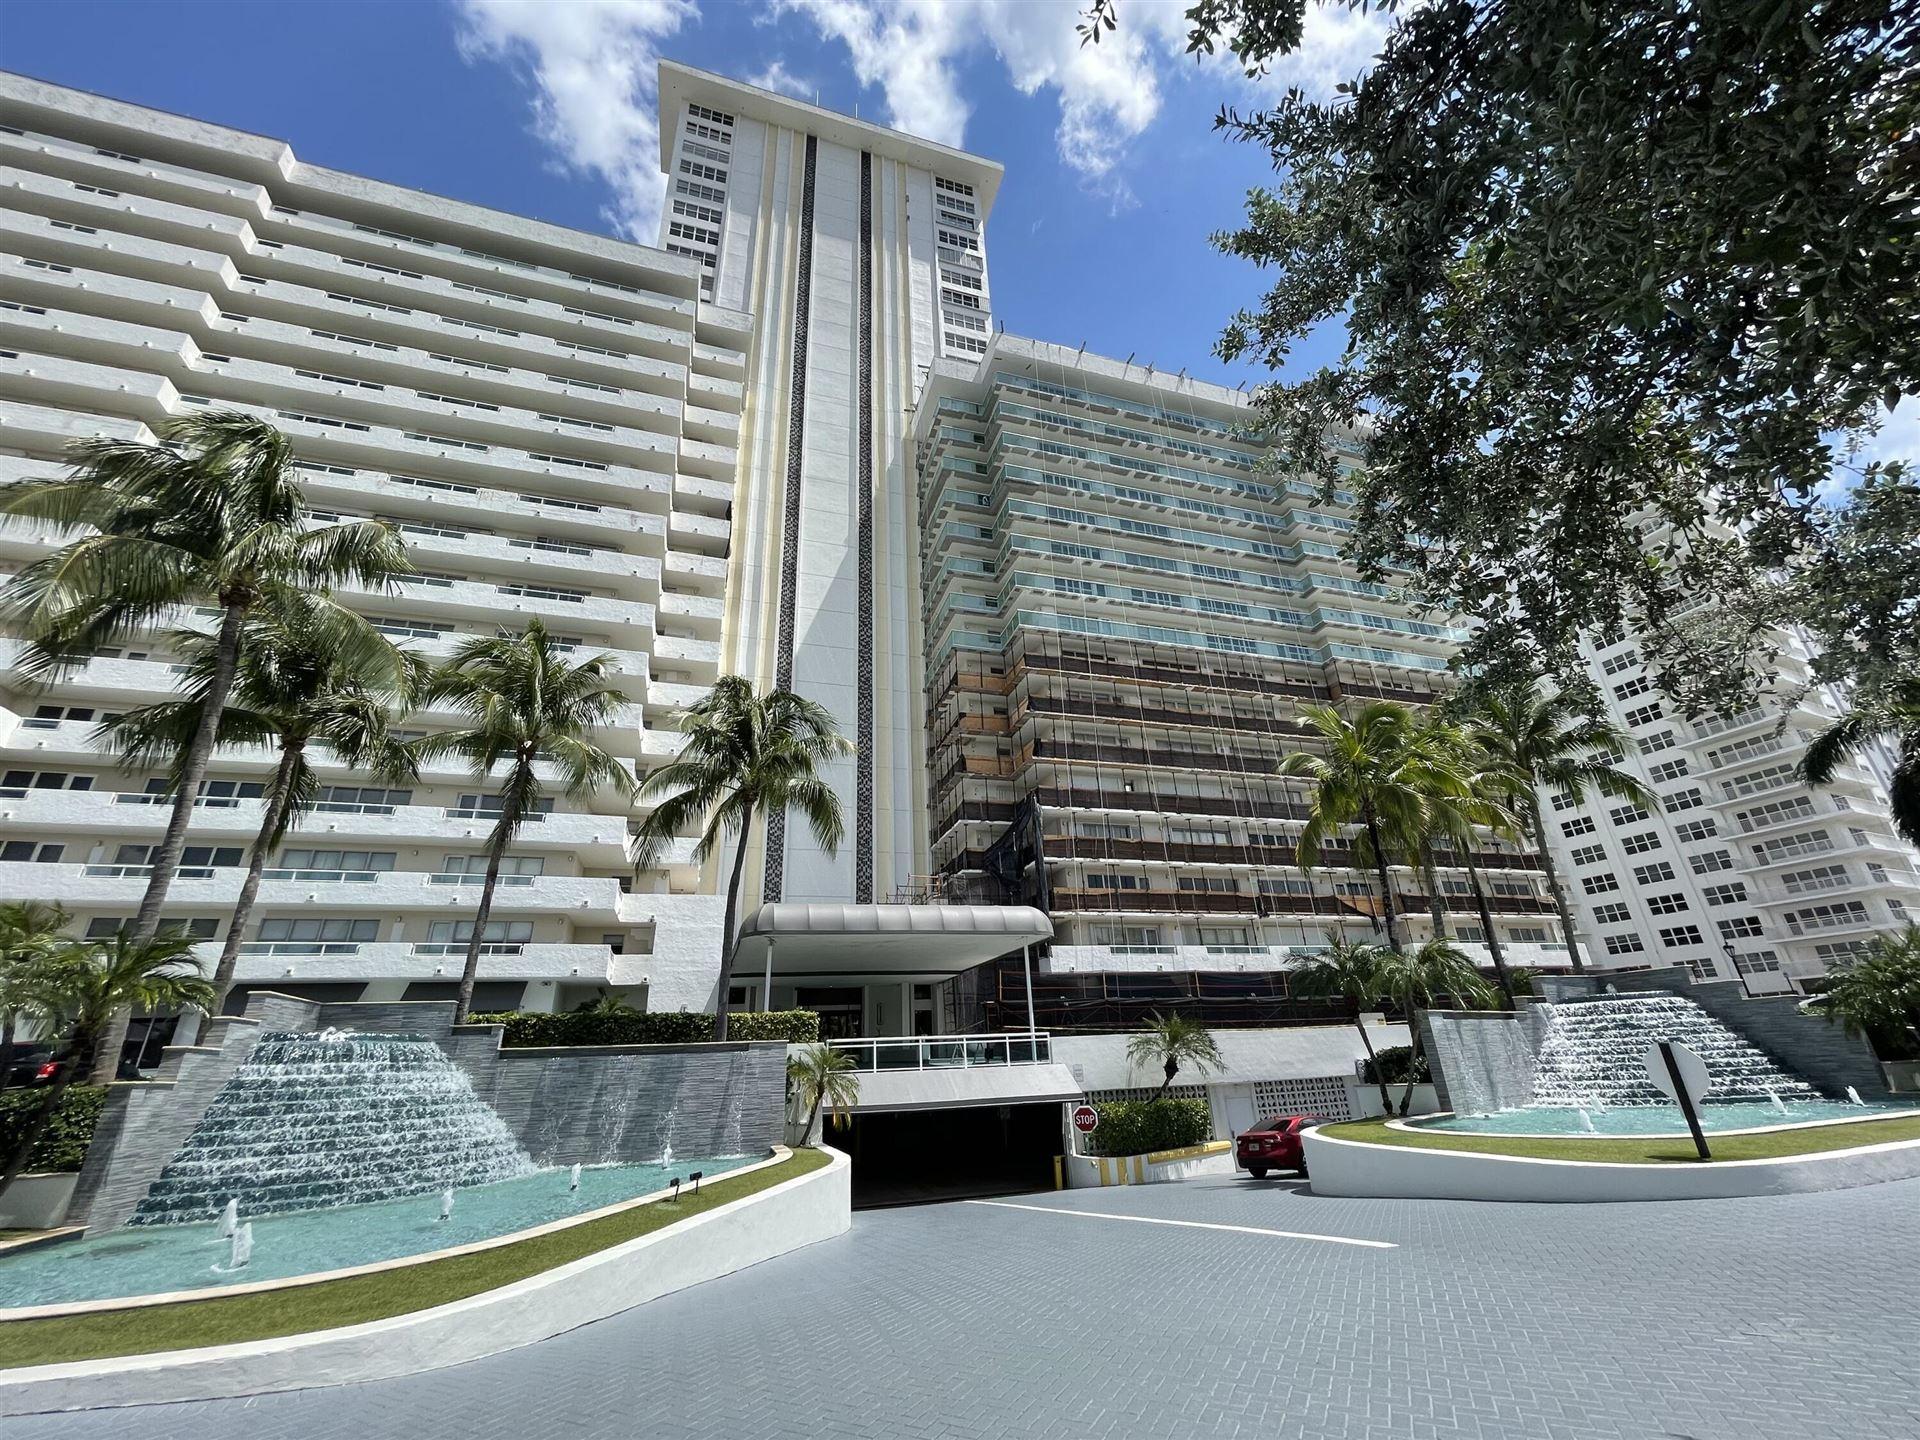 Photo of 3900 Galt Ocean Drive #604, Fort Lauderdale, FL 33308 (MLS # RX-10743912)